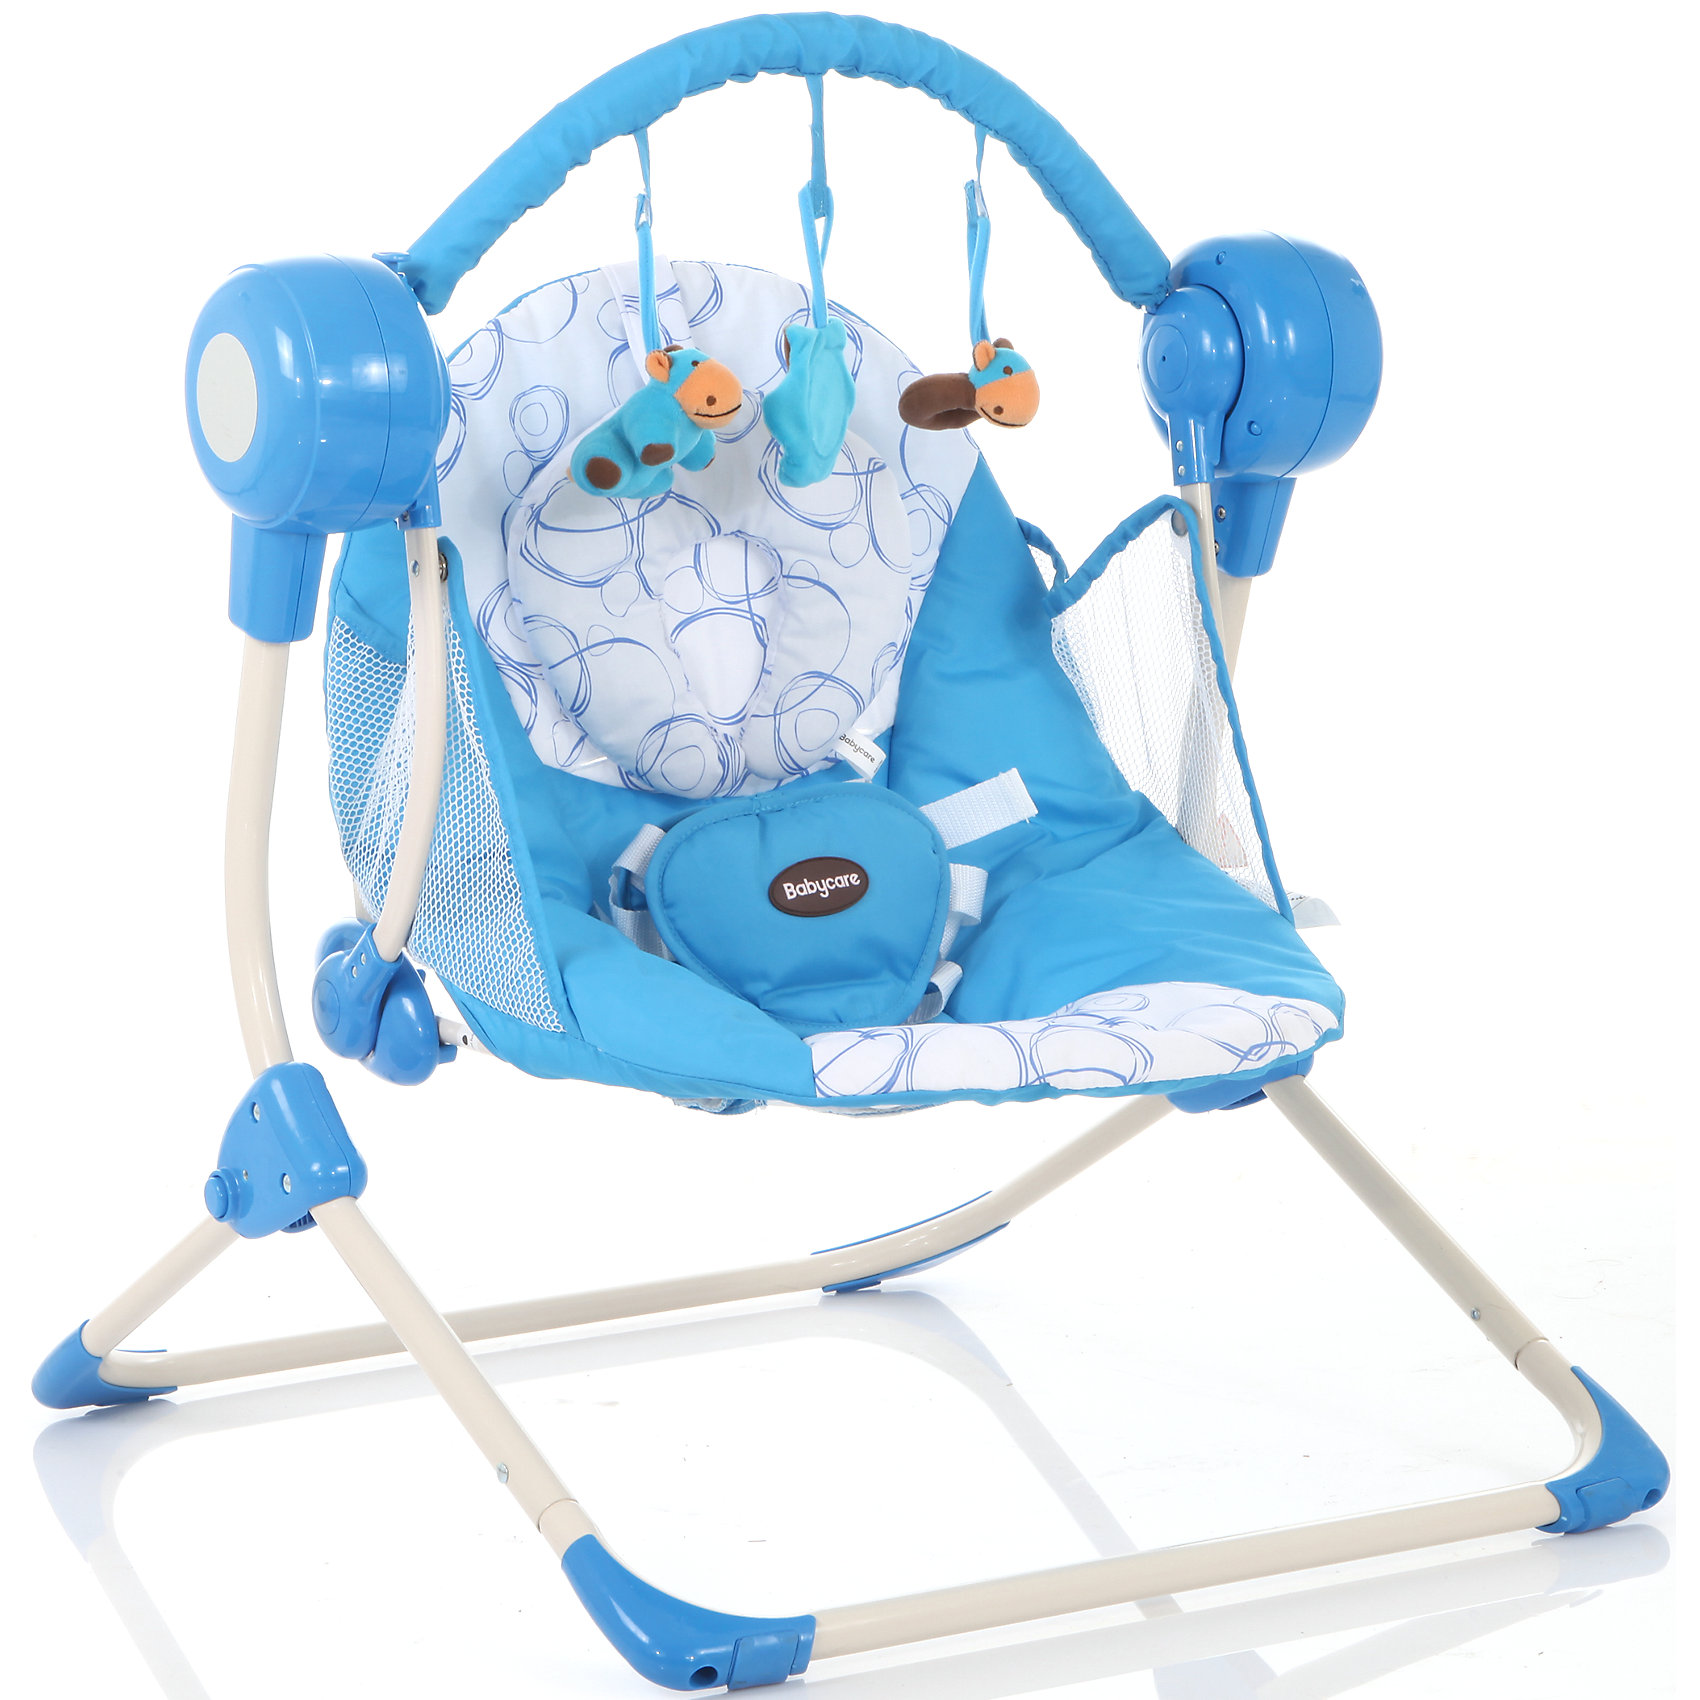 Baby Care Кресло-качели Balancelle, Baby Care, синий вилт малыш синий стд0308